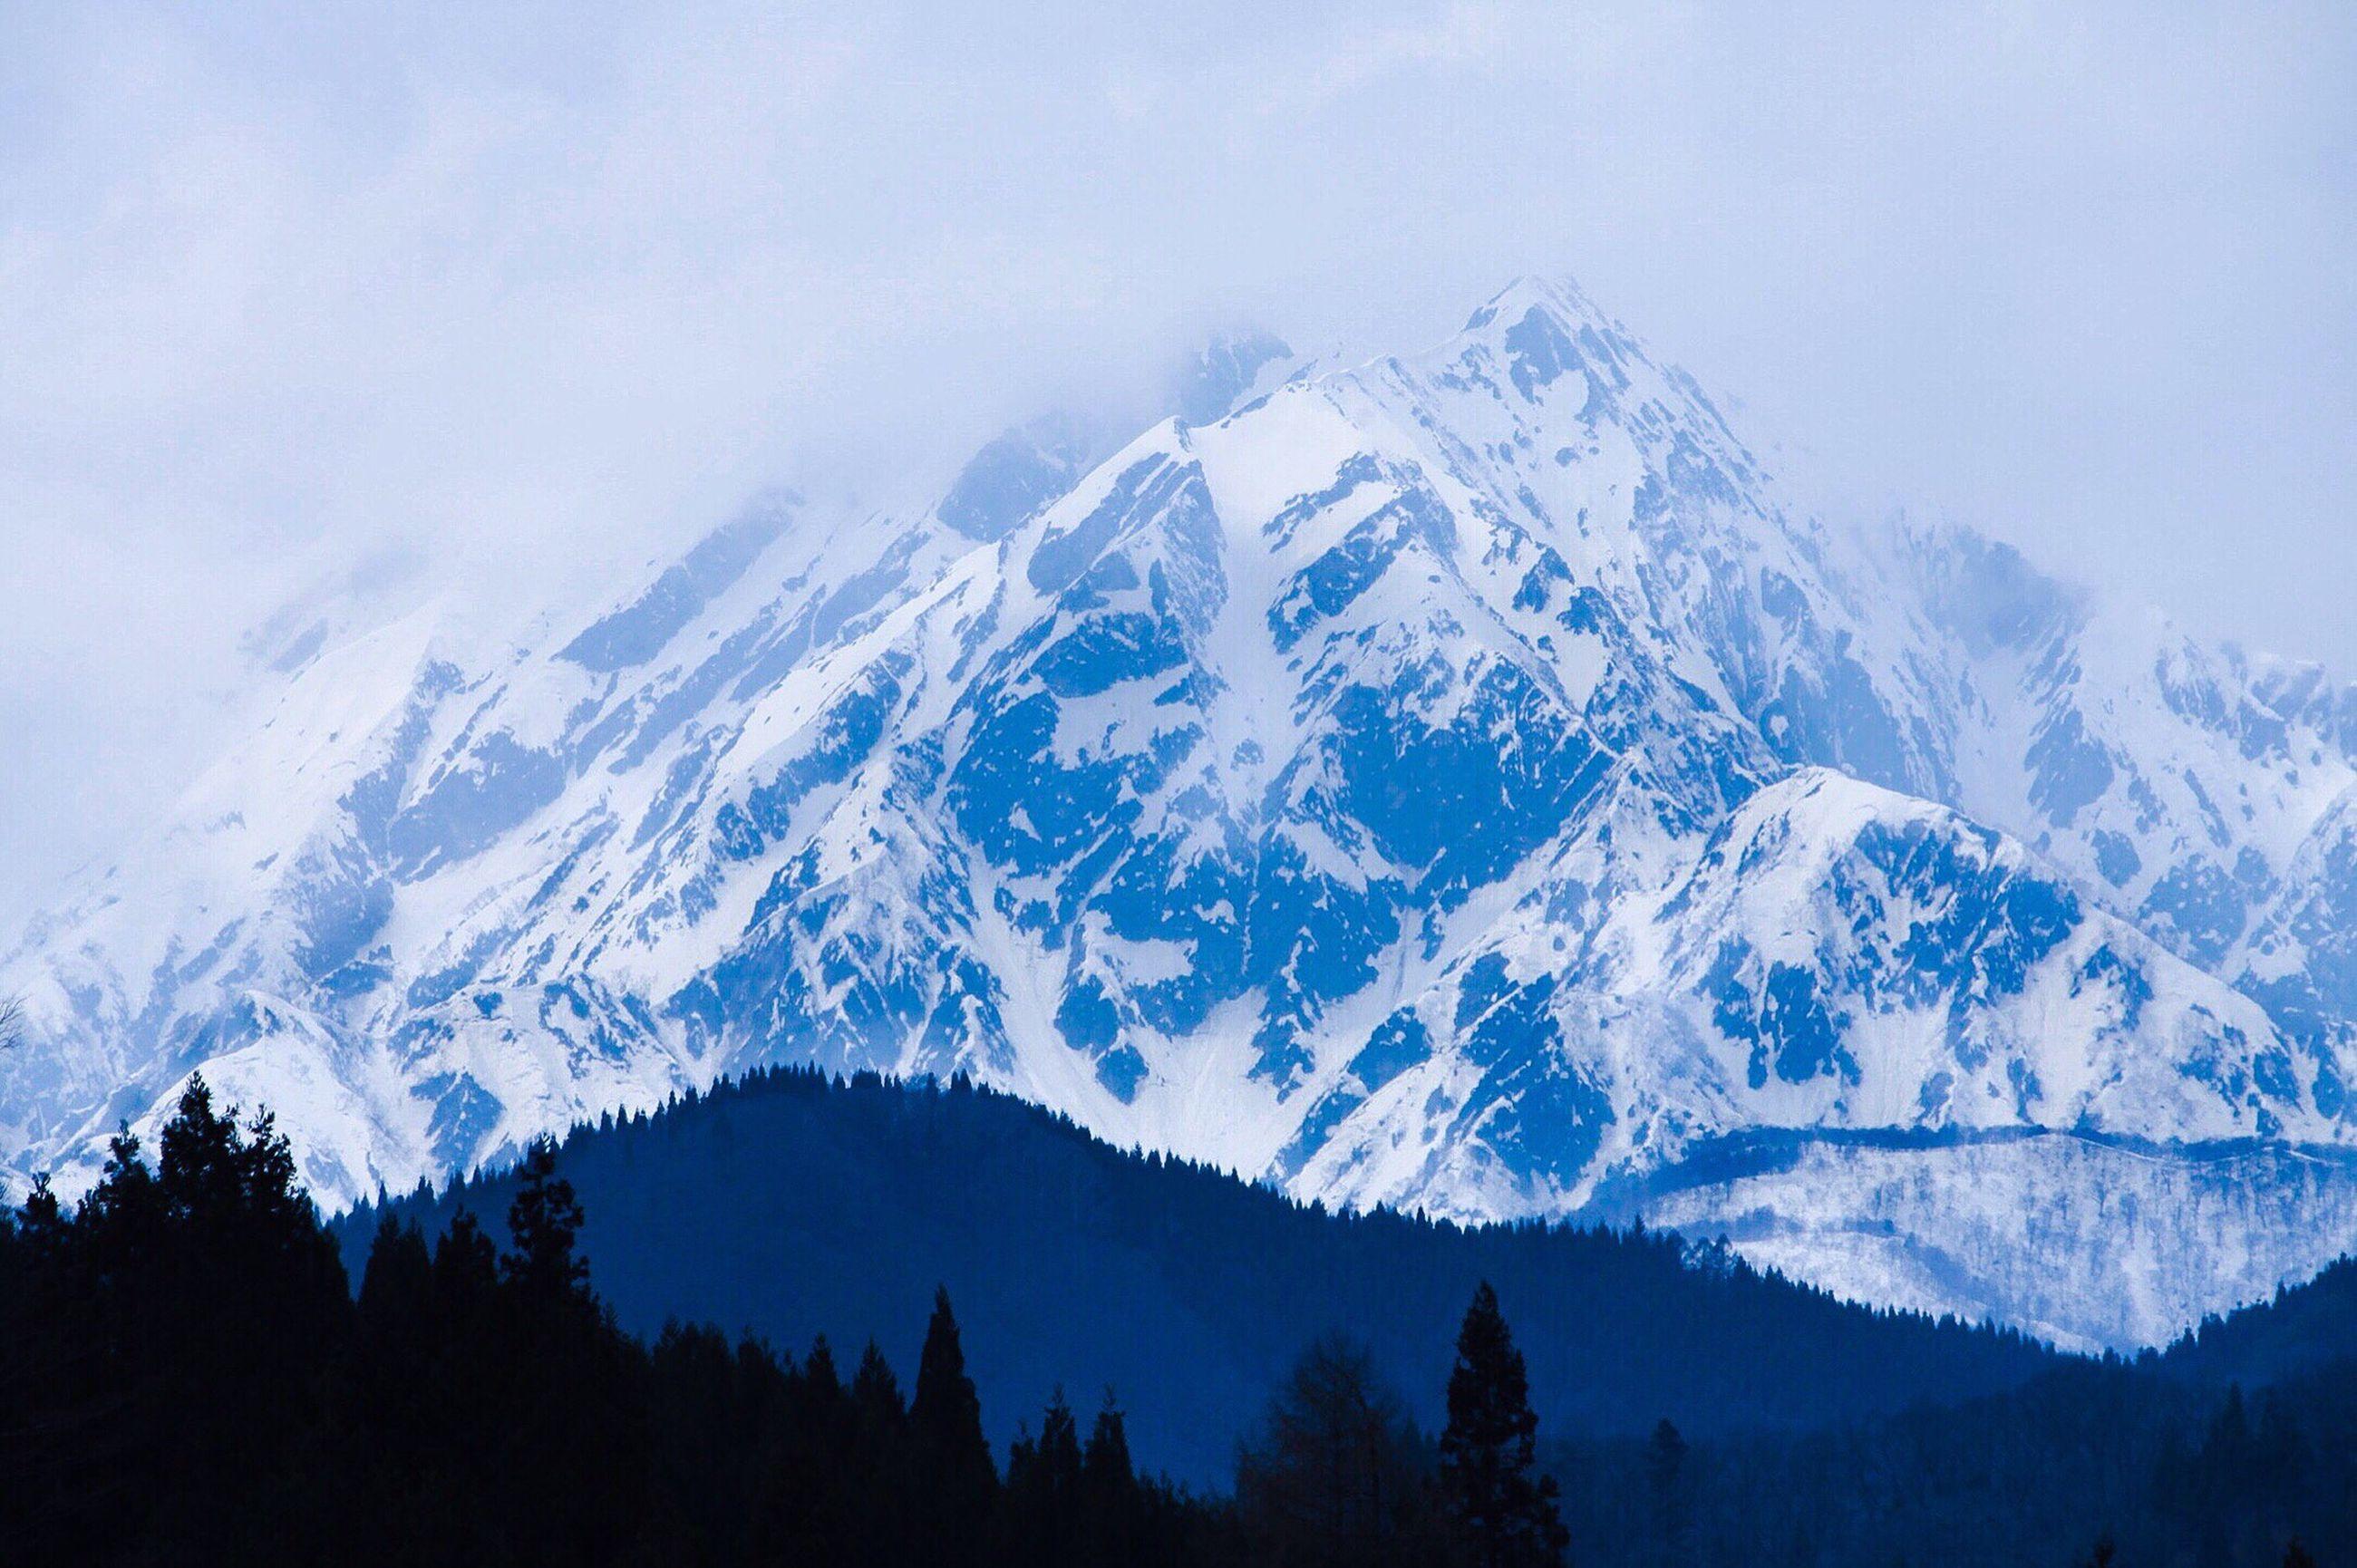 mountain, mountain range, scenics, snow, tranquil scene, tranquility, beauty in nature, winter, snowcapped mountain, cold temperature, nature, sky, tree, weather, idyllic, mountain peak, majestic, landscape, season, non-urban scene